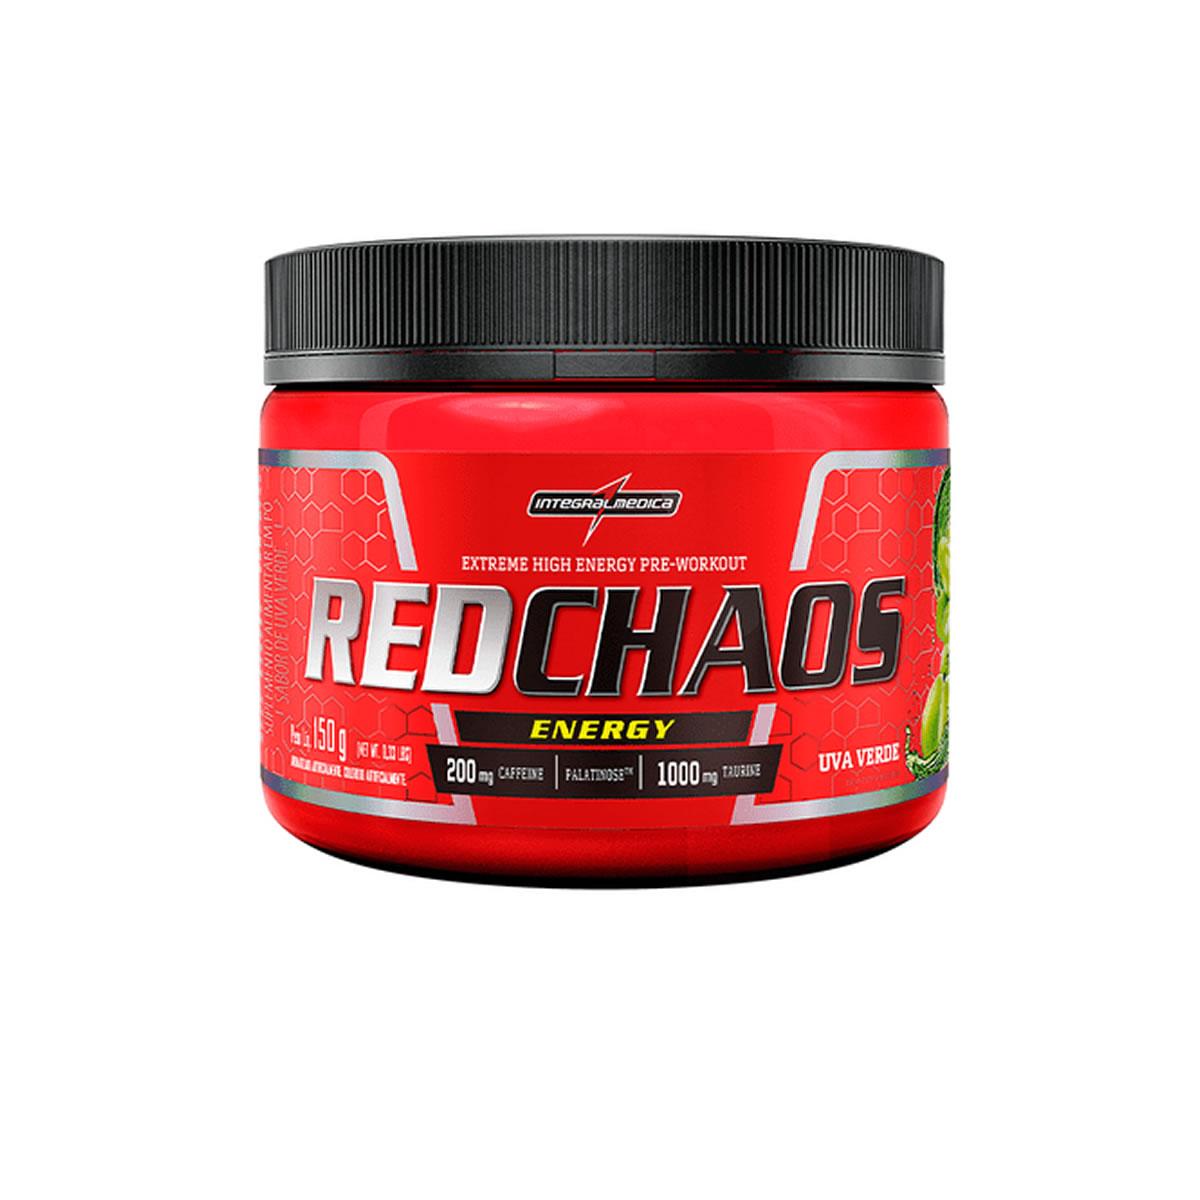 Suplemento Alimentar Red Chaos sabor Uva verde 150g - Integralmedica